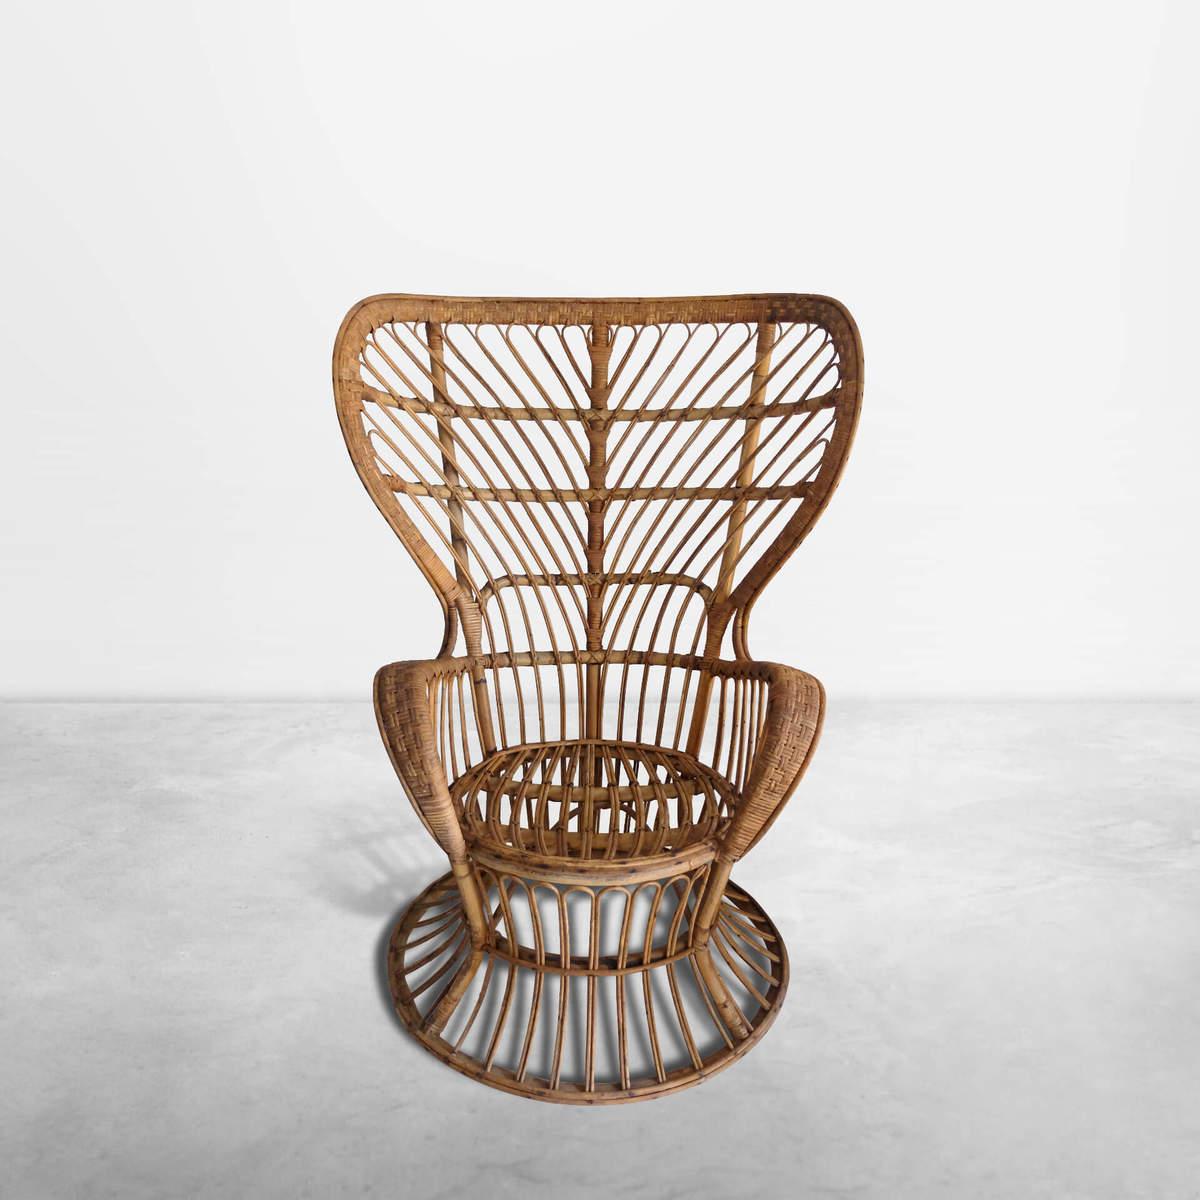 Lio Carminati & Gio Ponti for Bonacina, Italian Mid-century rattan armchair in perfect conditions, 1950s